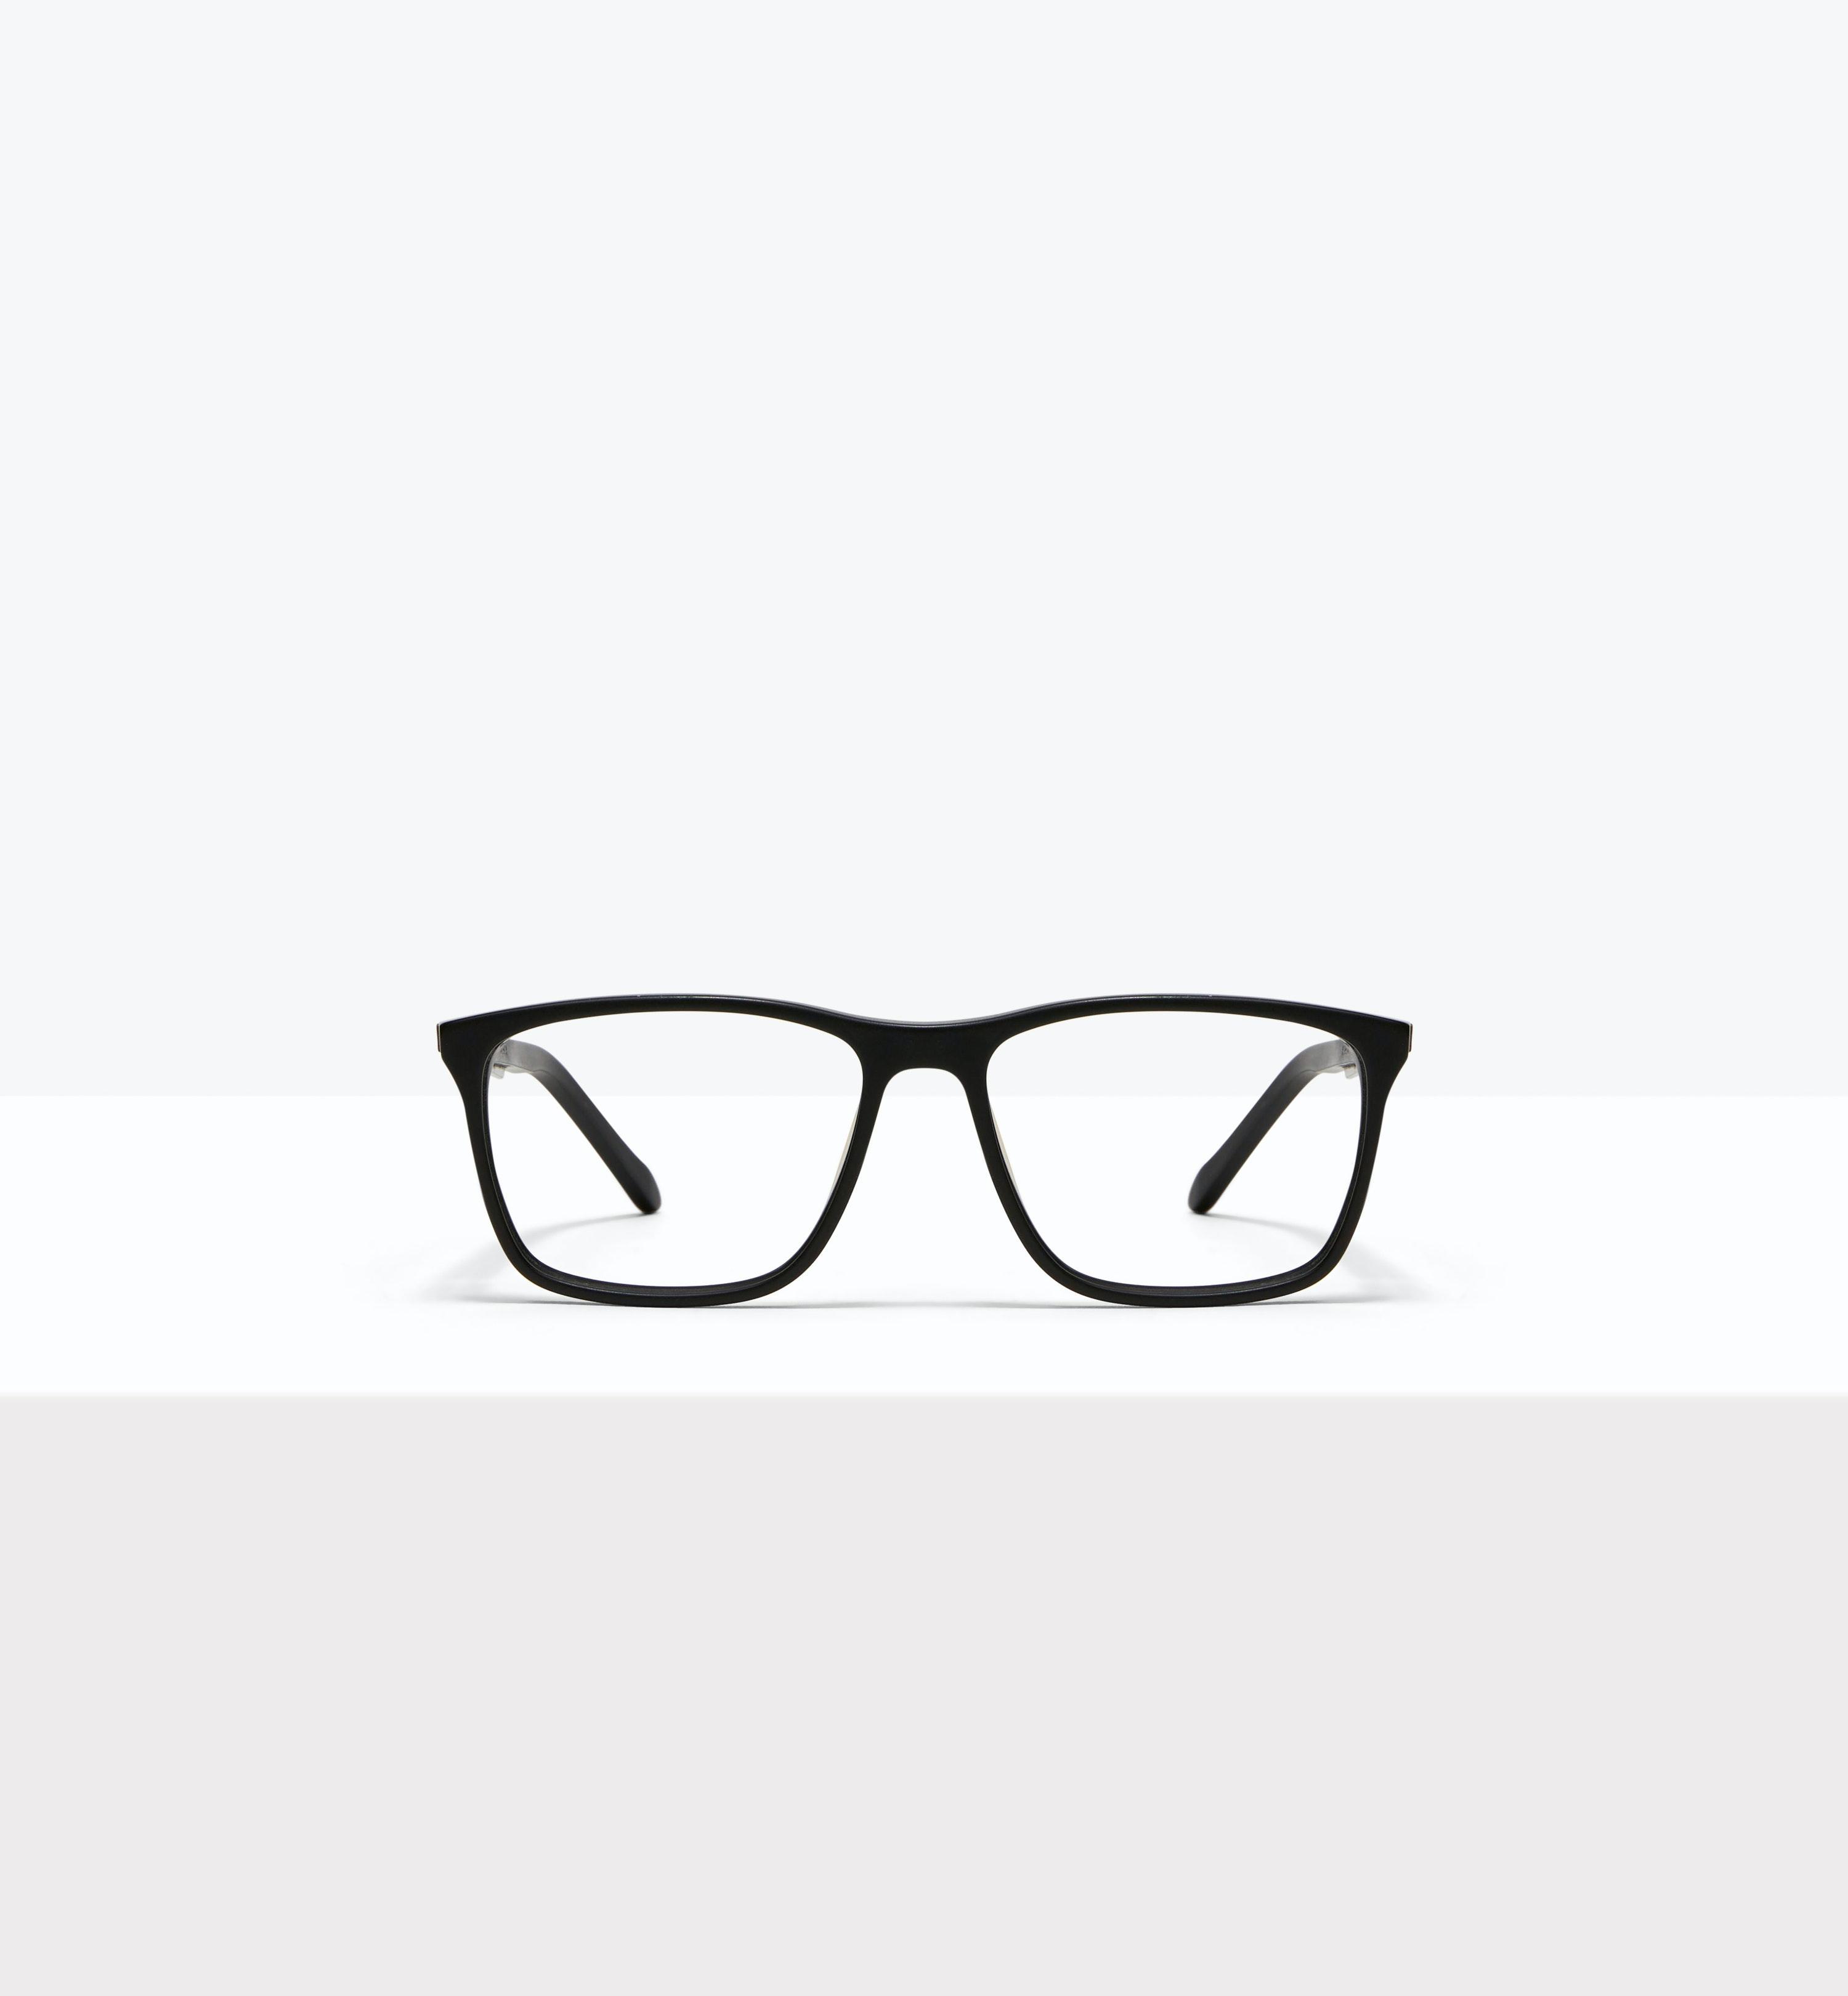 Affordable Fashion Glasses Rectangle Eyeglasses Men Skill Matt Black